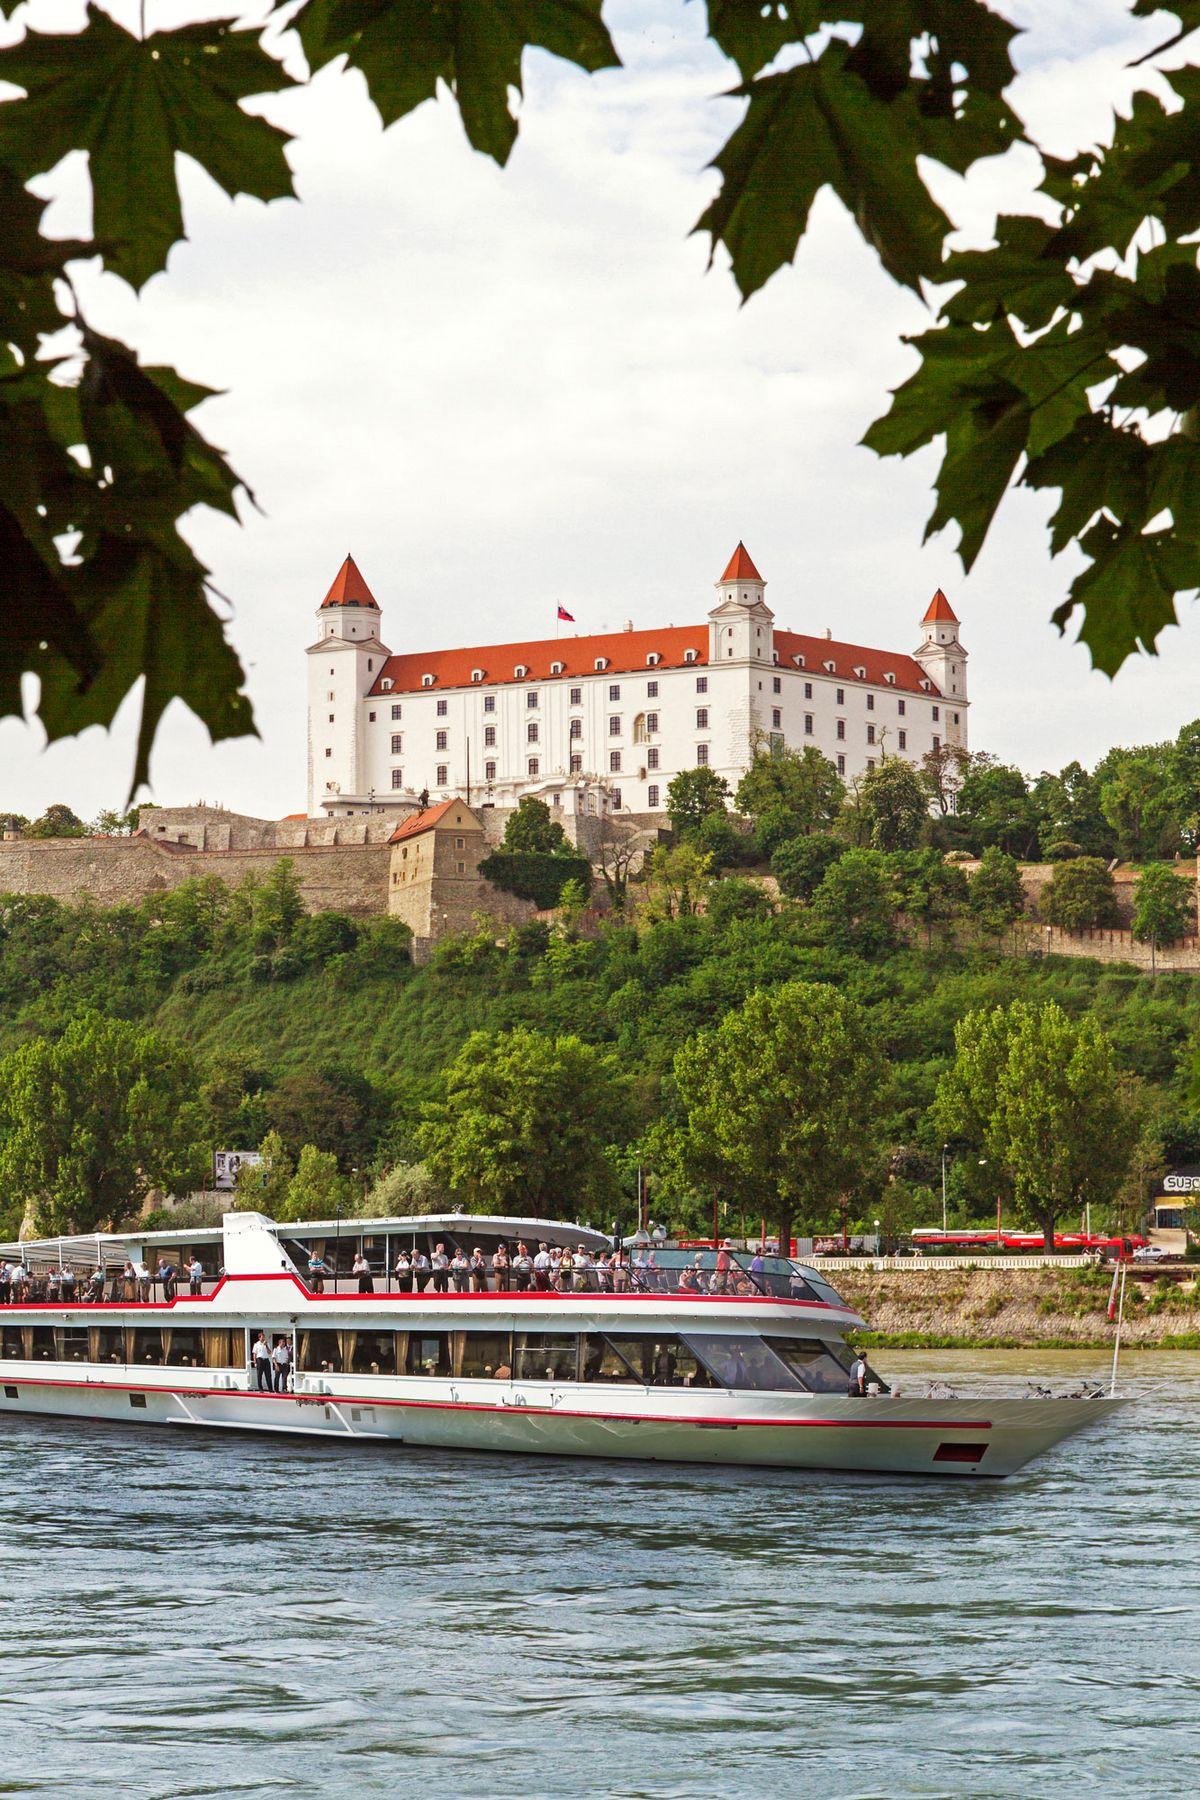 MSKE Bratislava Burg mit Blaettern c Donau Touristik Marlene Wagenhofer web